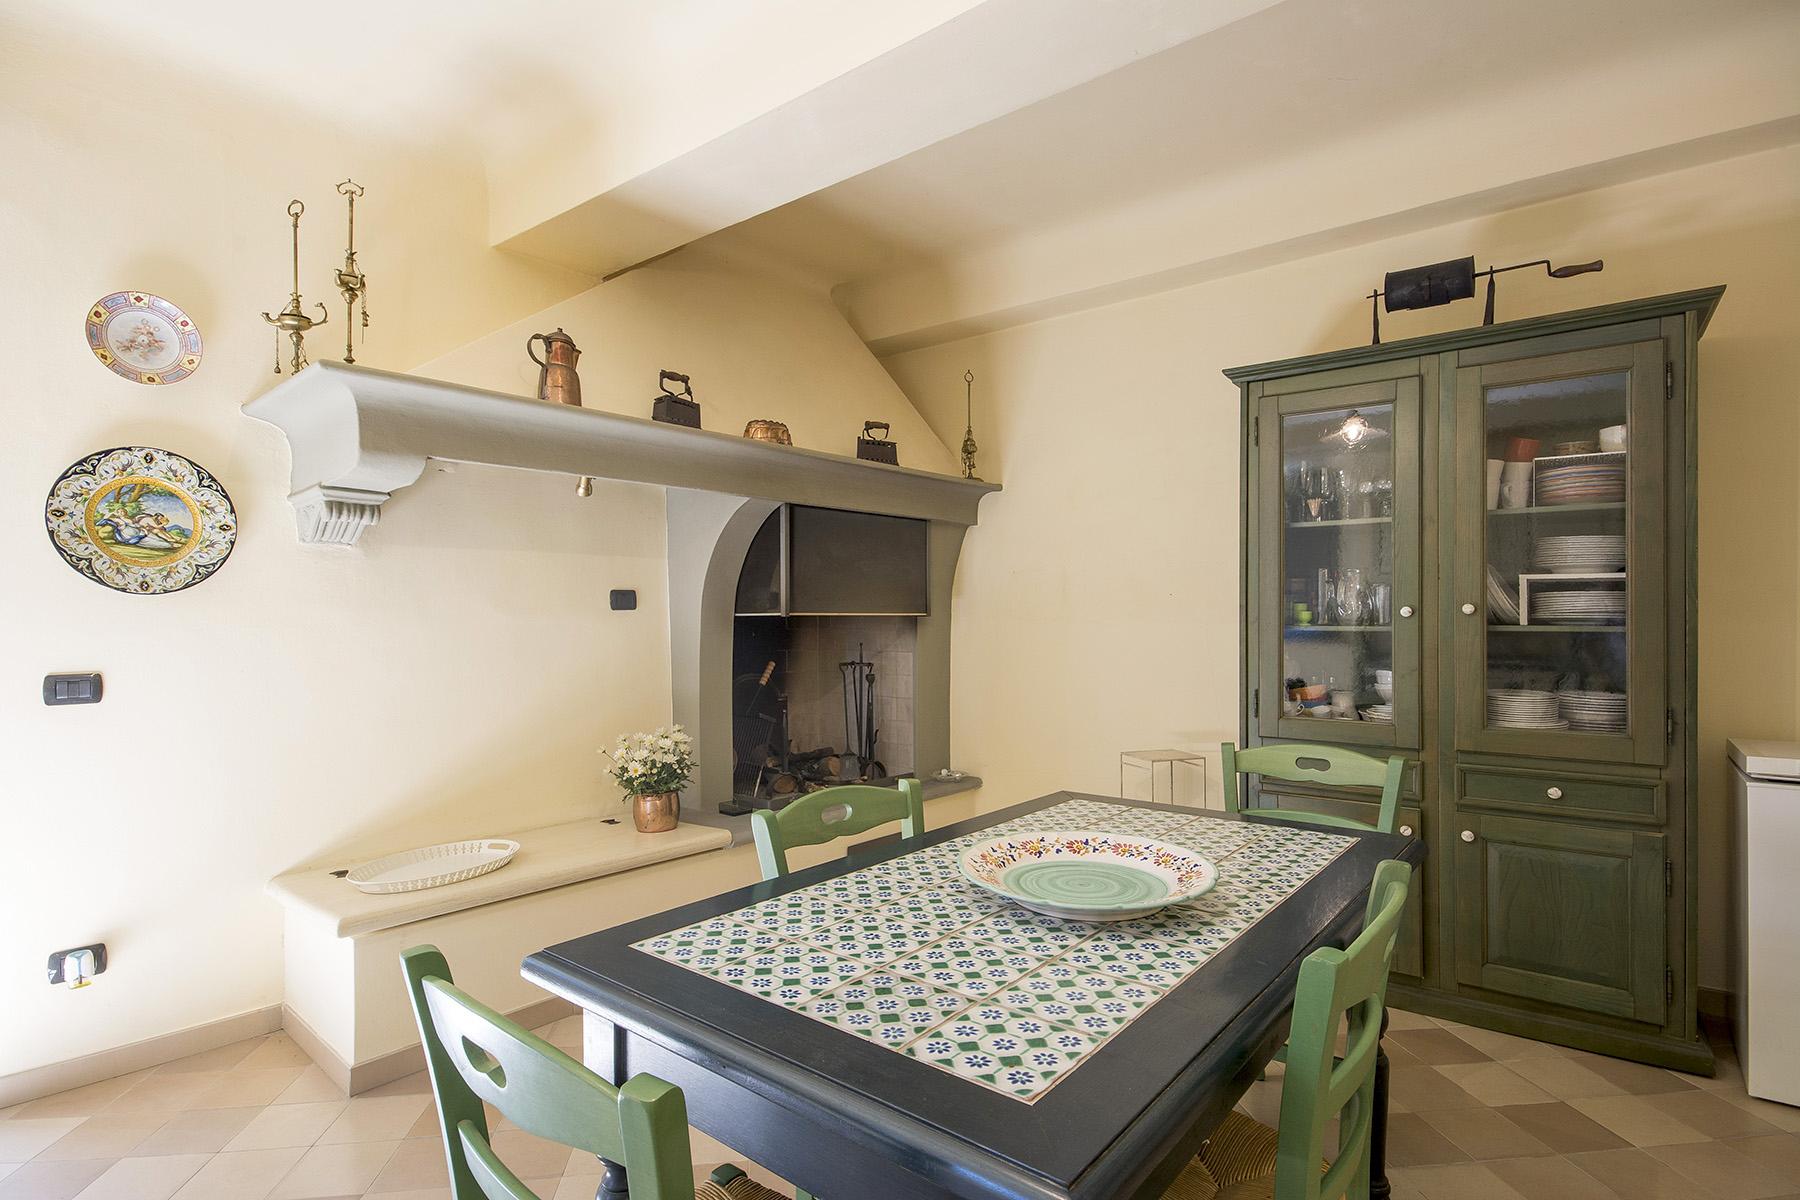 Villa in Vendita a Lucca: 5 locali, 1150 mq - Foto 7